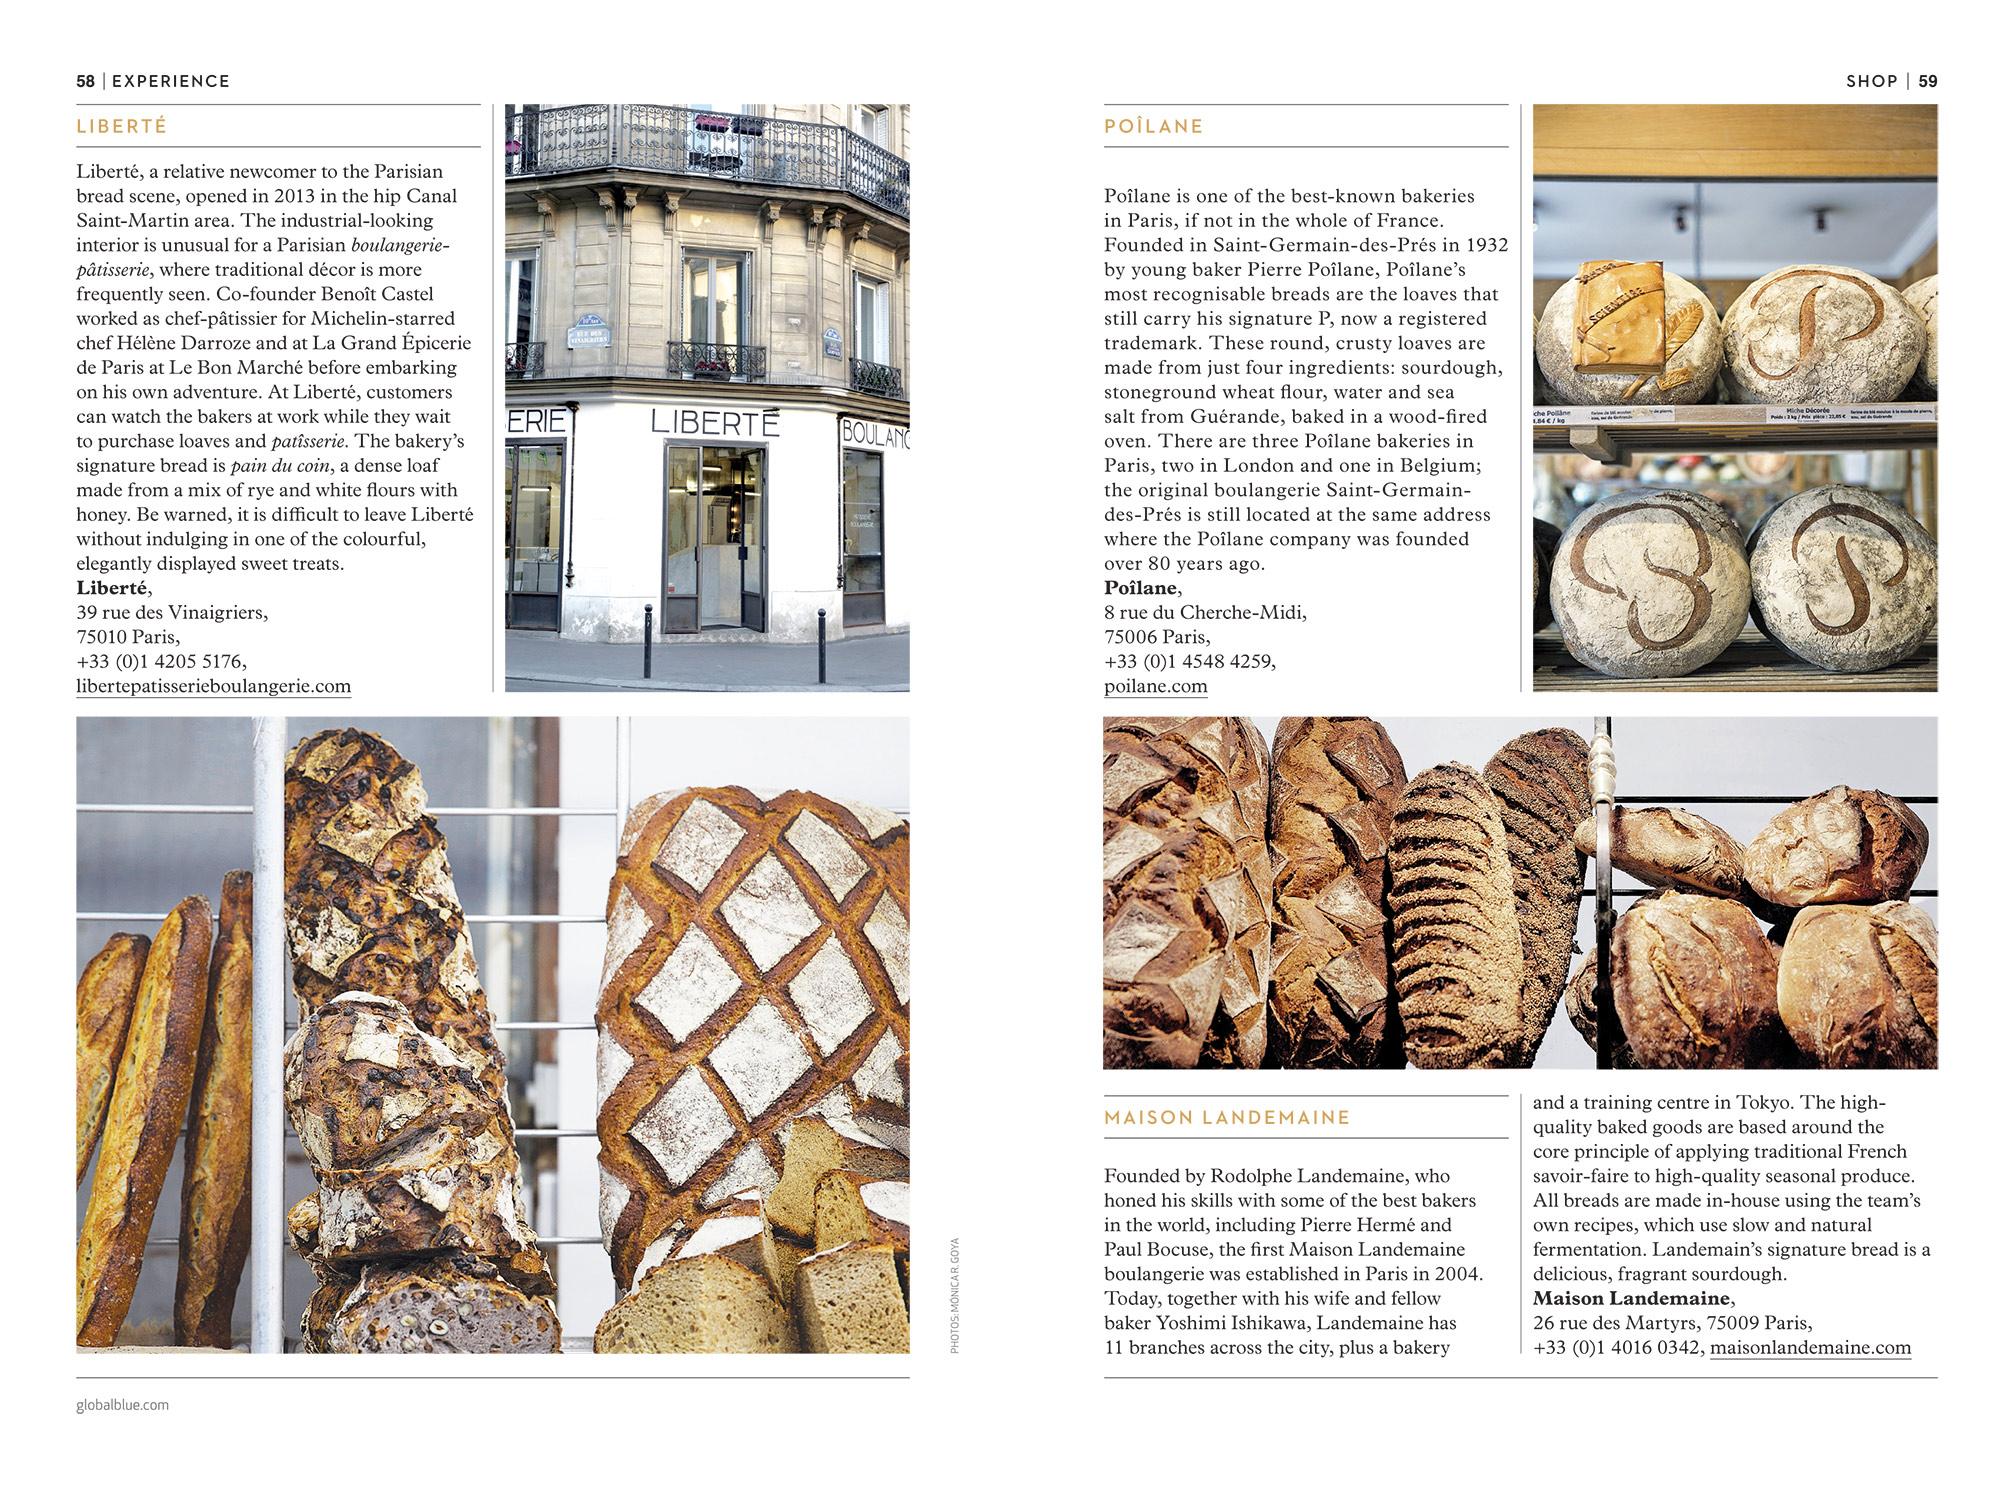 Paris-Lux-ss17-bread-01.jpg